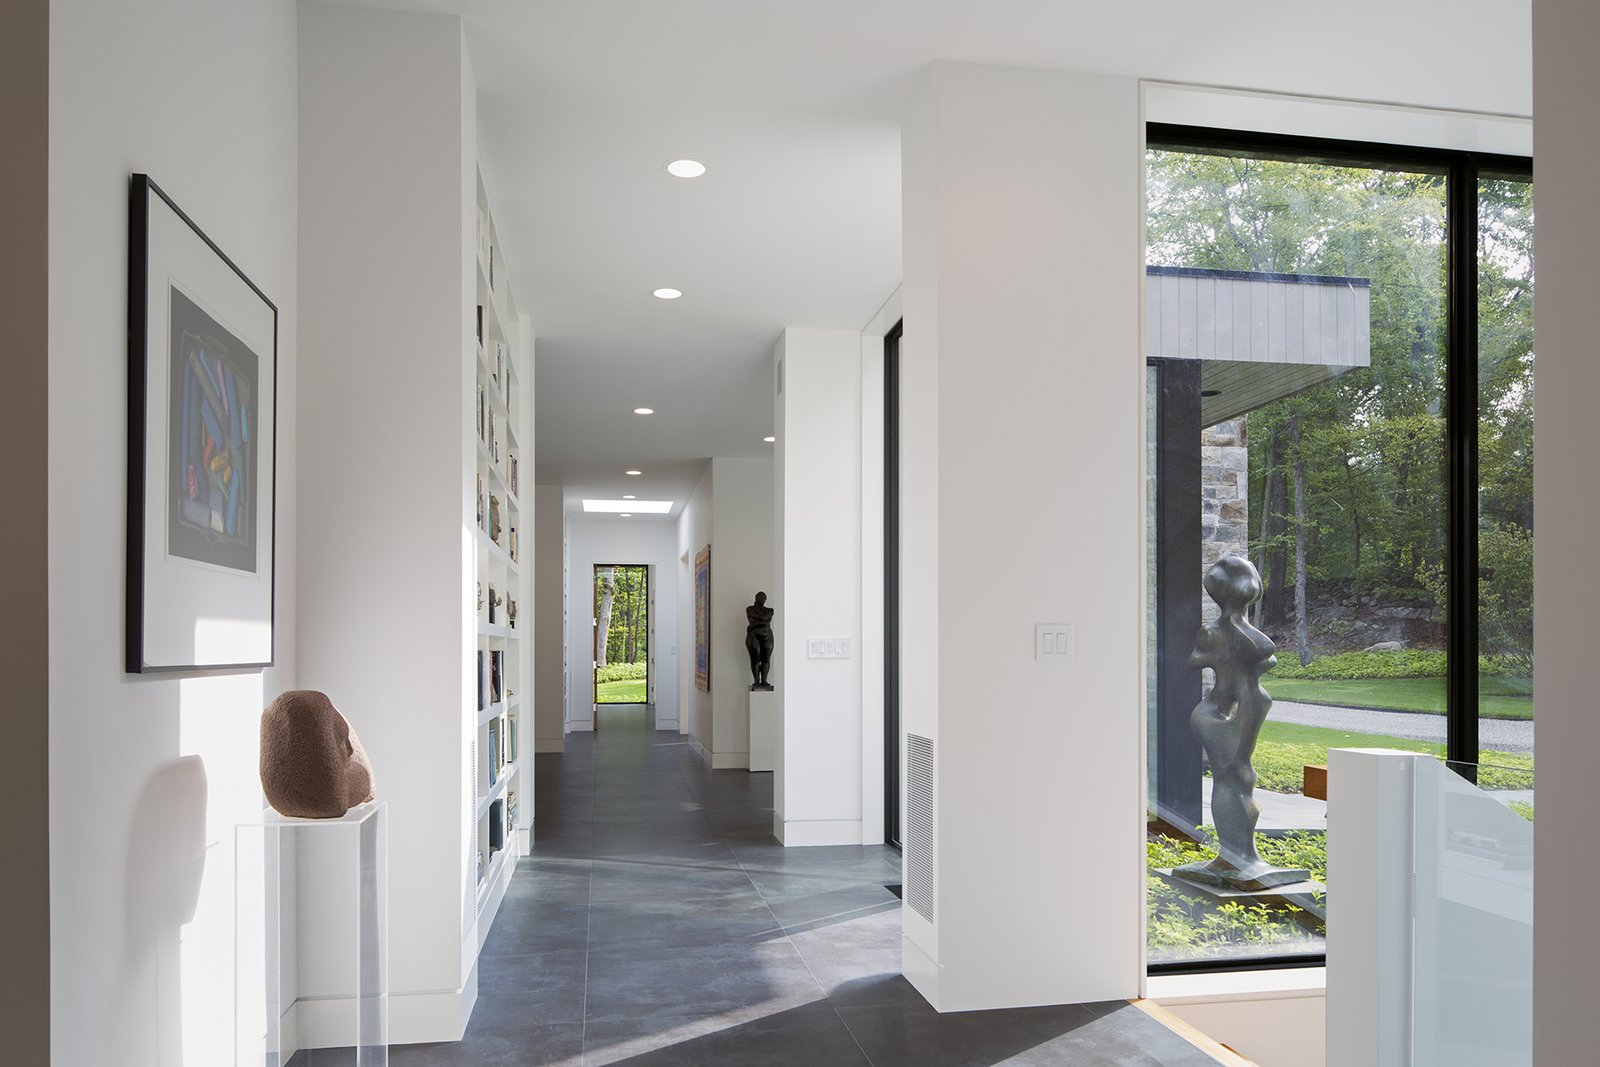 Art House 2.0 Interior: Gallery Like Hallway  Art House 2.0